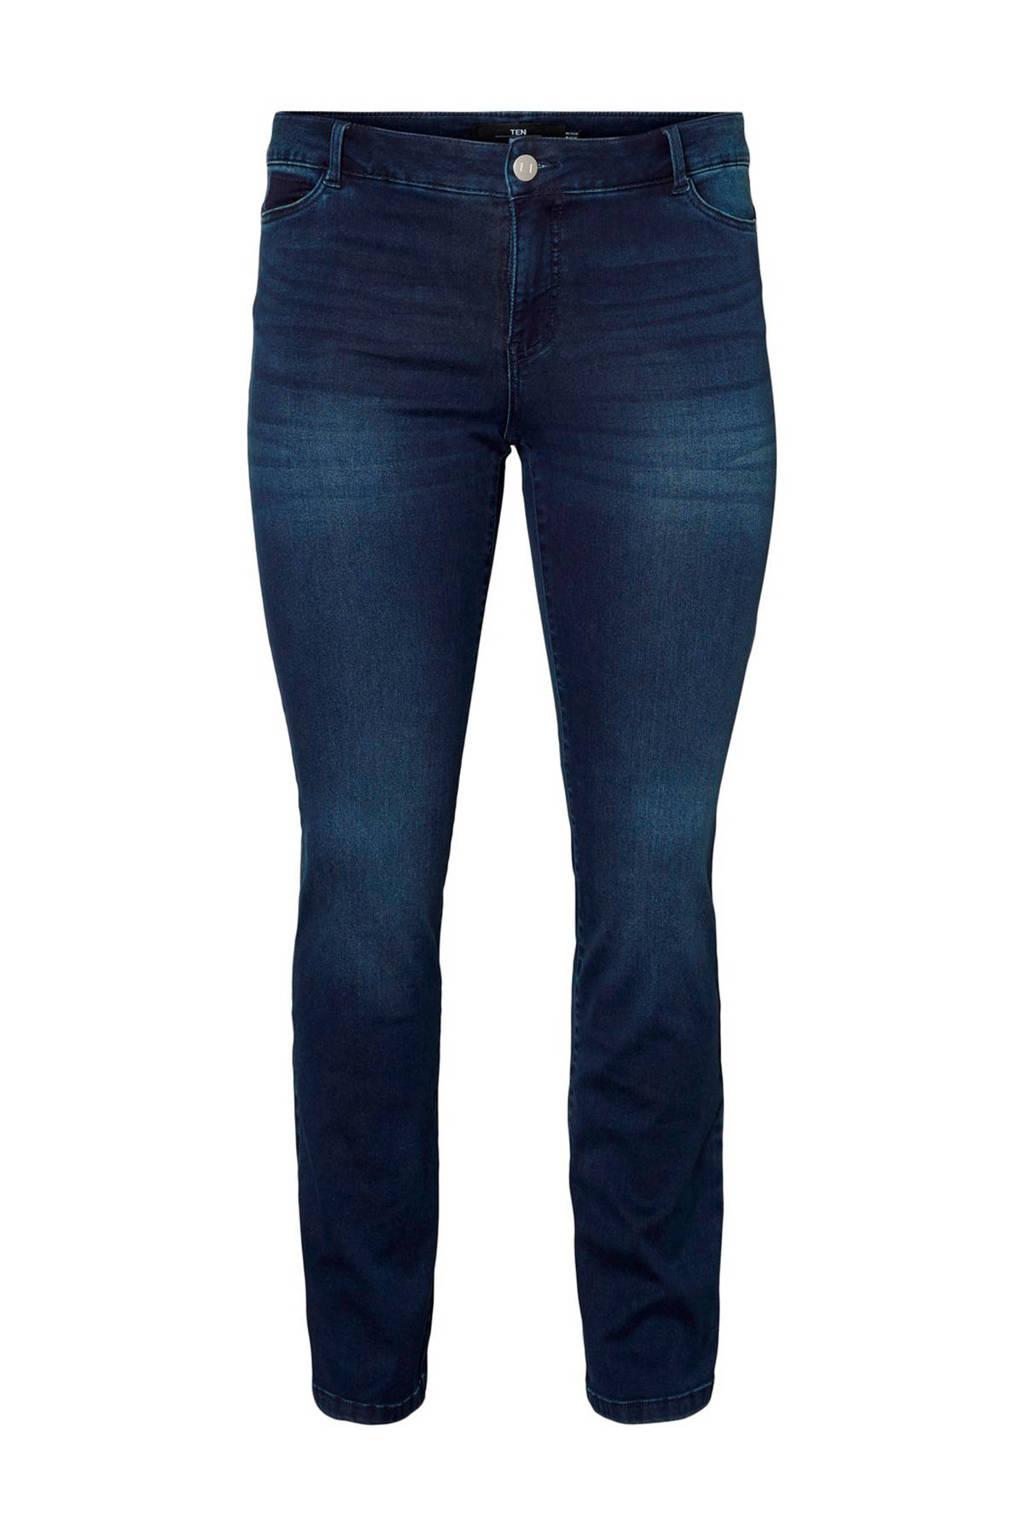 JUNAROSE slim fit jeans donkerblauw, Donkerblauw